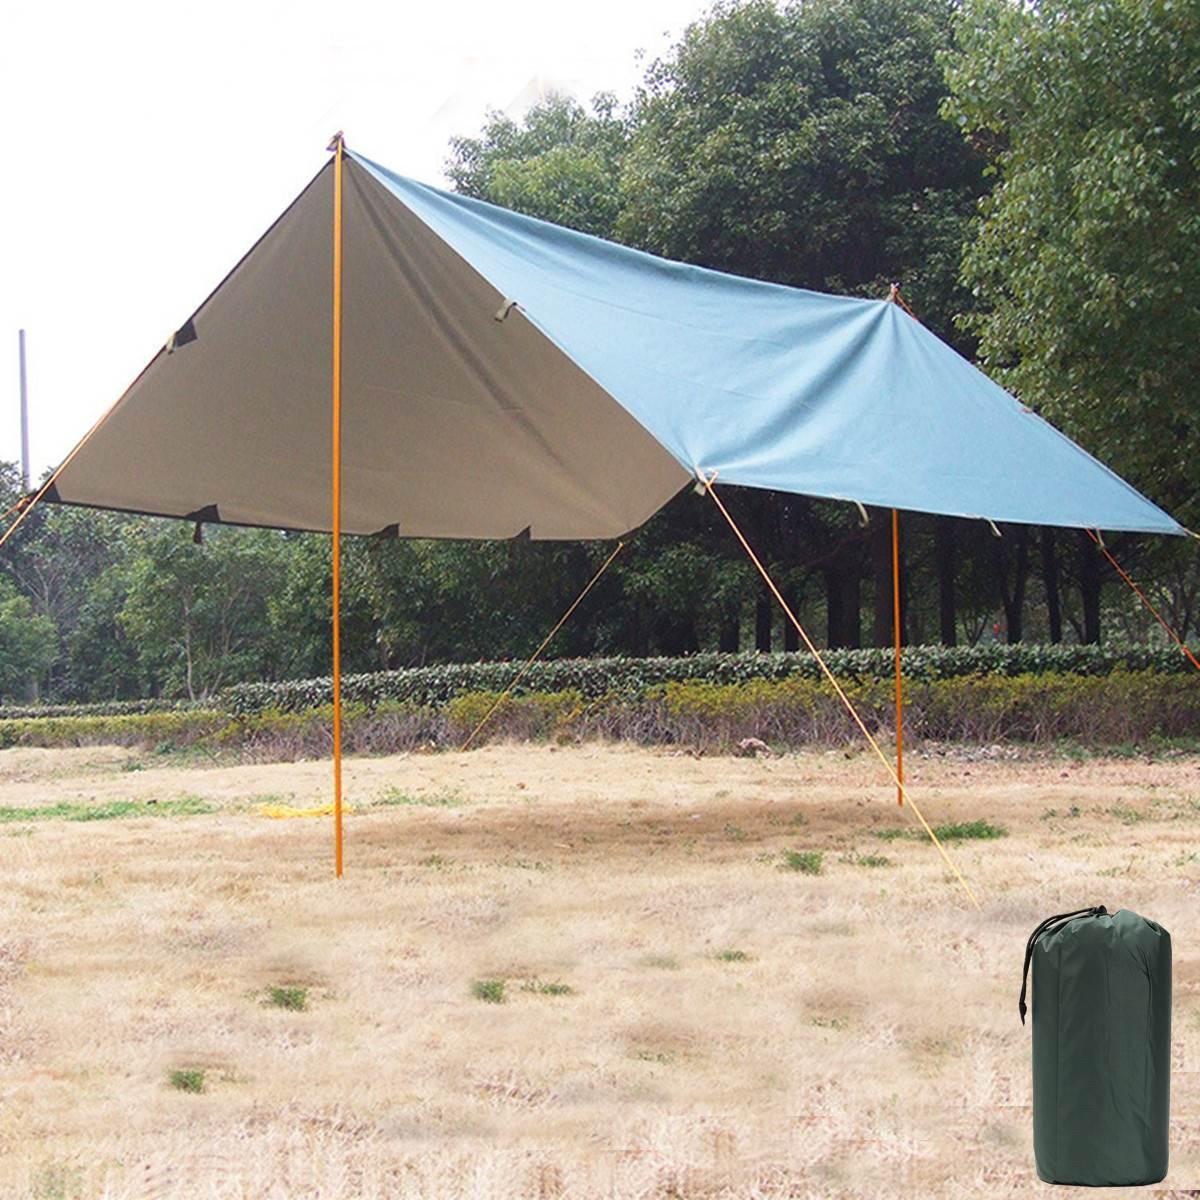 3mx3.2m Ultralight Outdoor C&ing Tent Coating Canopy Lightweight Oxford Gazebo Beach Sun Shelter Outdoor Beach Travel Kits Cat Shelter Shelter Homes From ... & 3mx3.2m Ultralight Outdoor Camping Tent Coating Canopy Lightweight ...